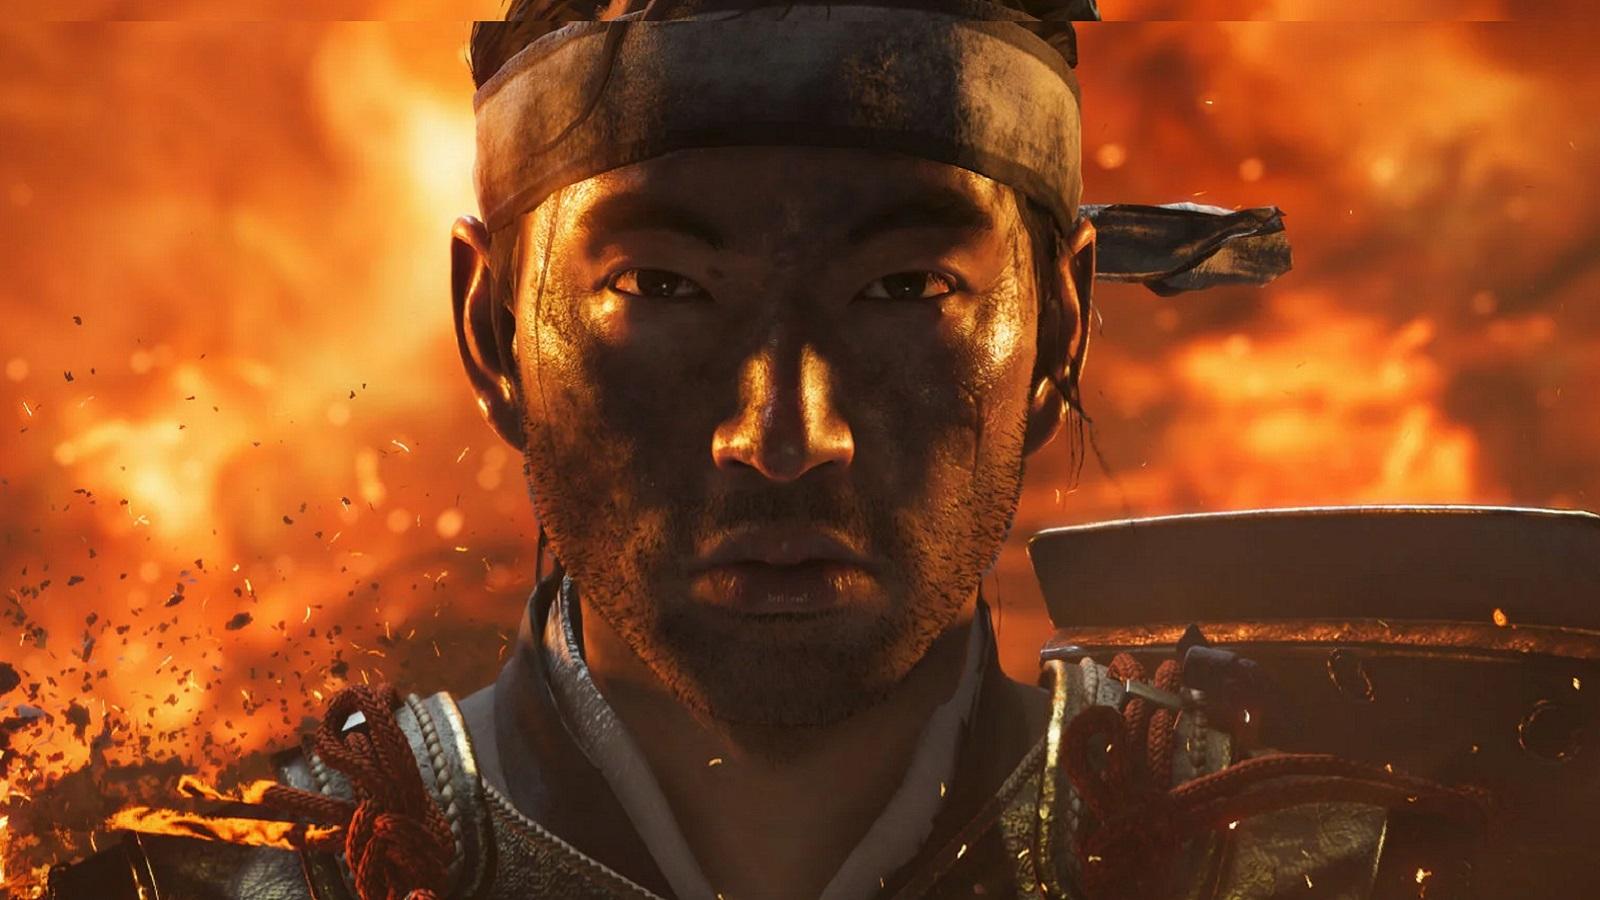 Ghost of Tsushima, screenshot: Samuraj